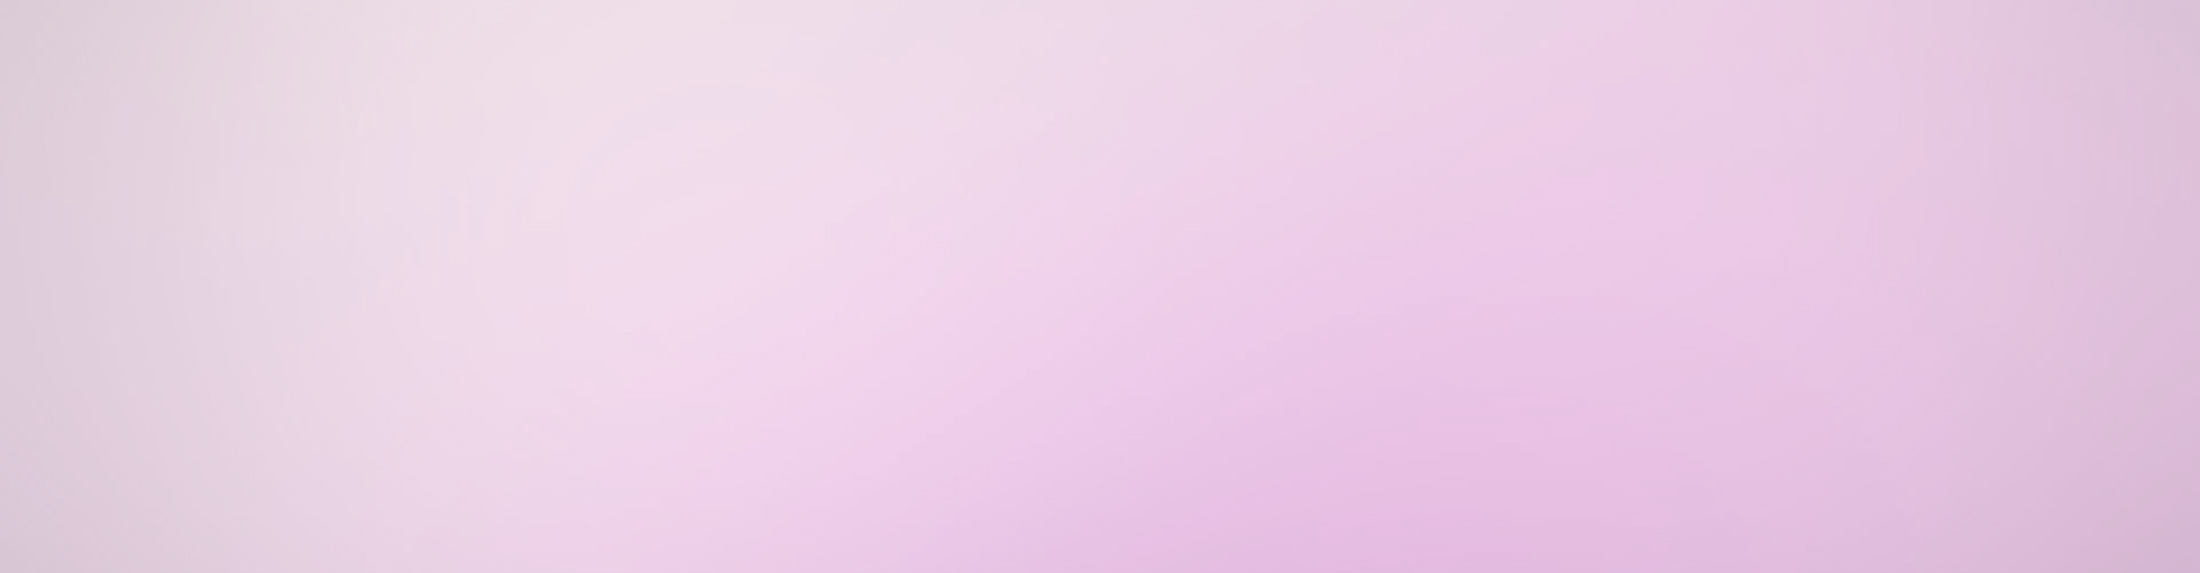 Light-pink-blur-background